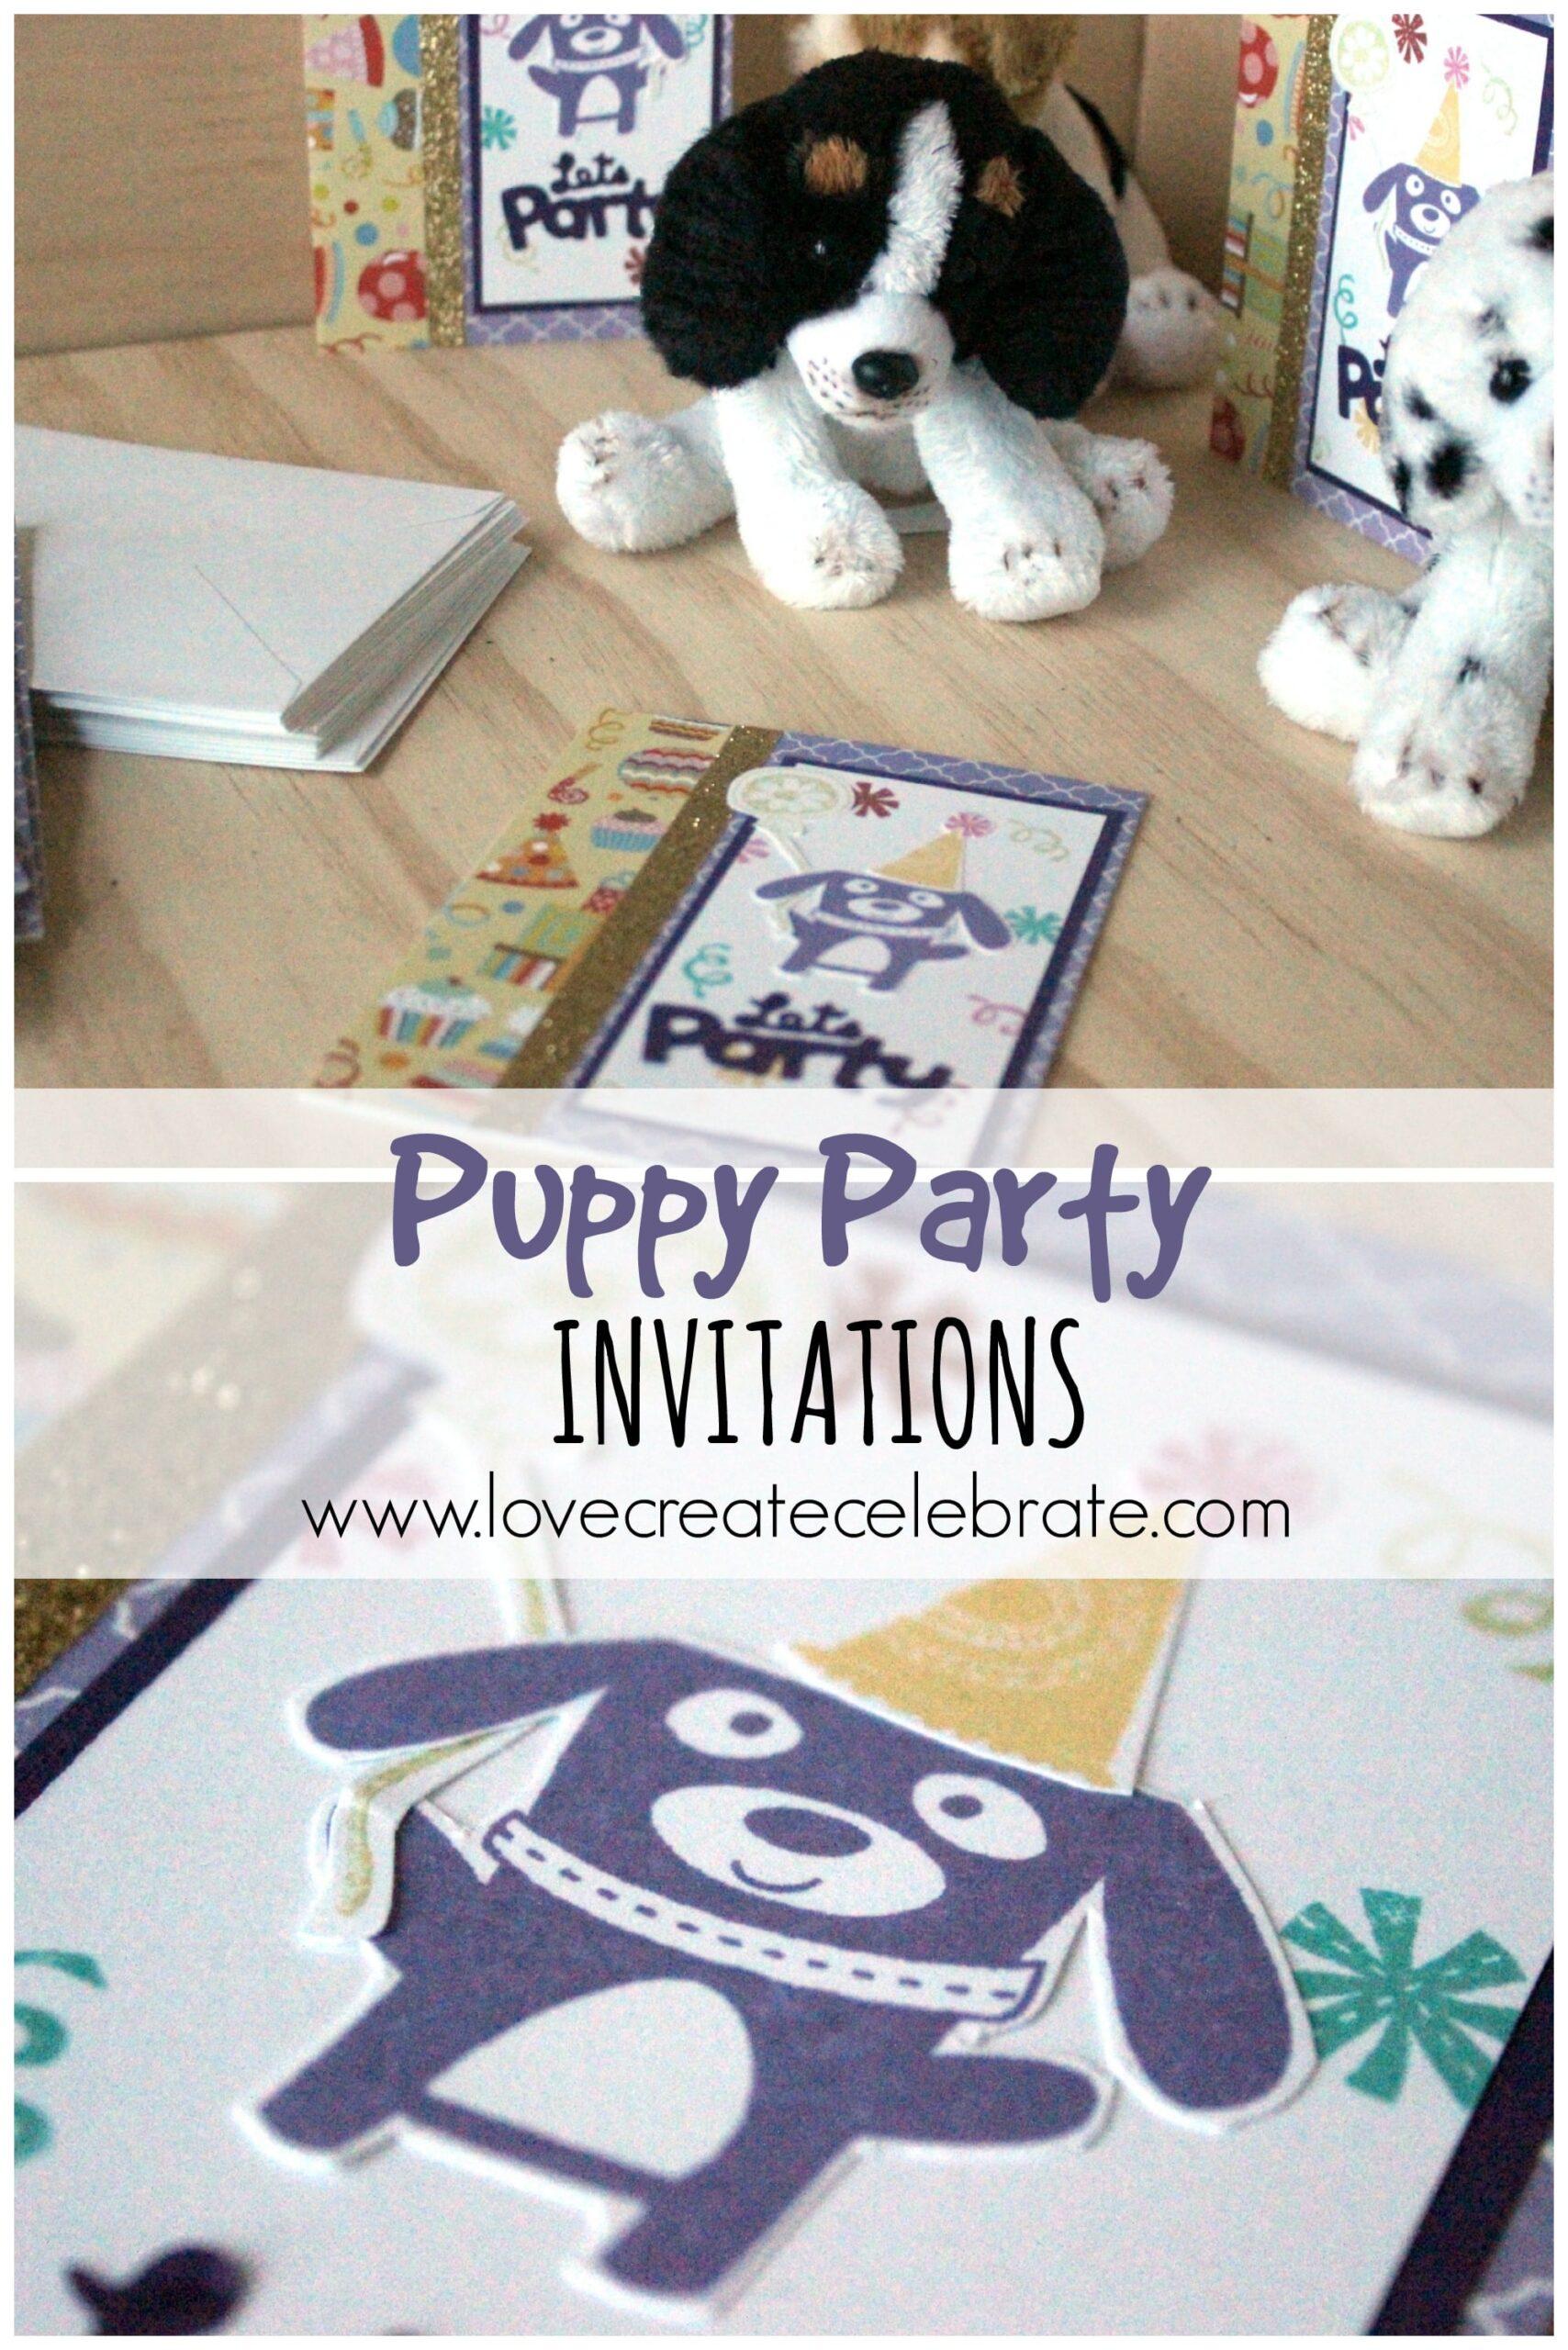 Puppy Party Invitations - Love Create Celebrate